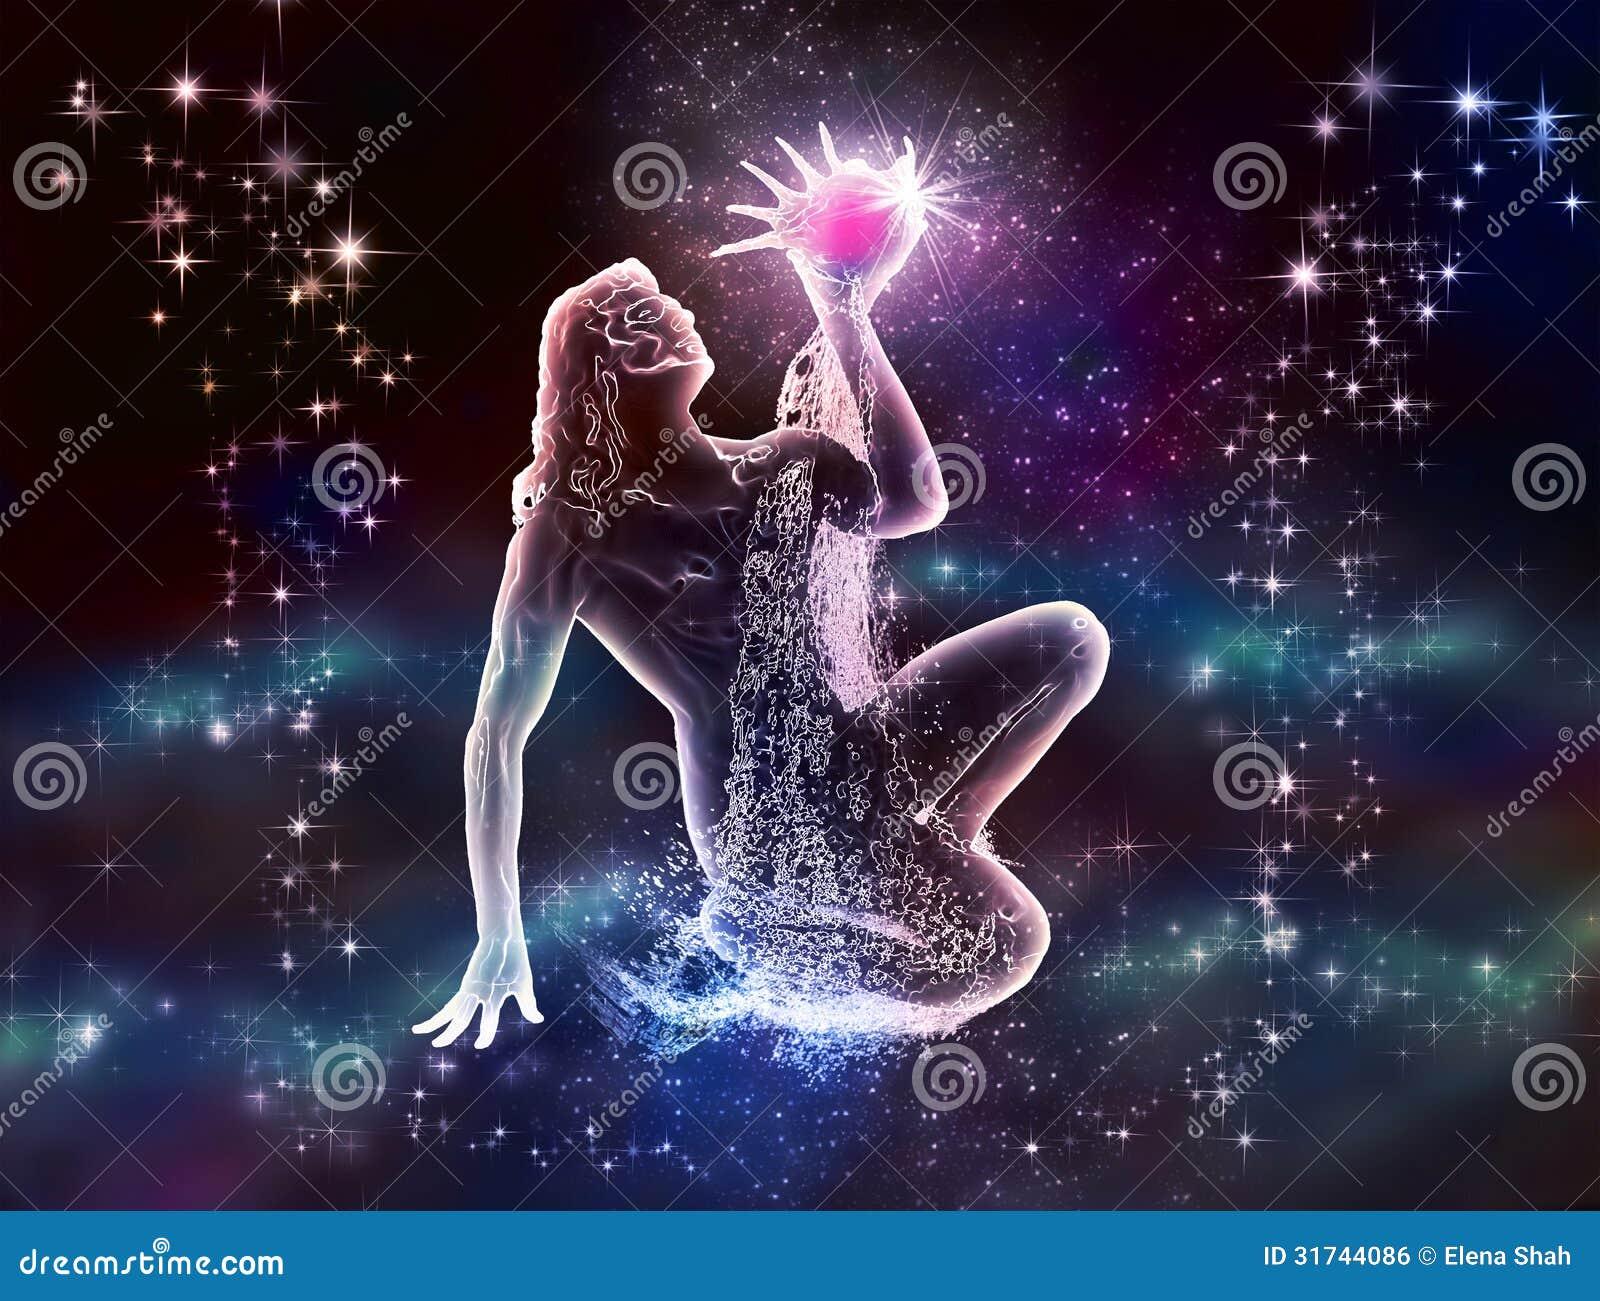 Zodiac Aquarius Water-Bearer is mystique and charm  The night sky and    Water Bearer Aquarius